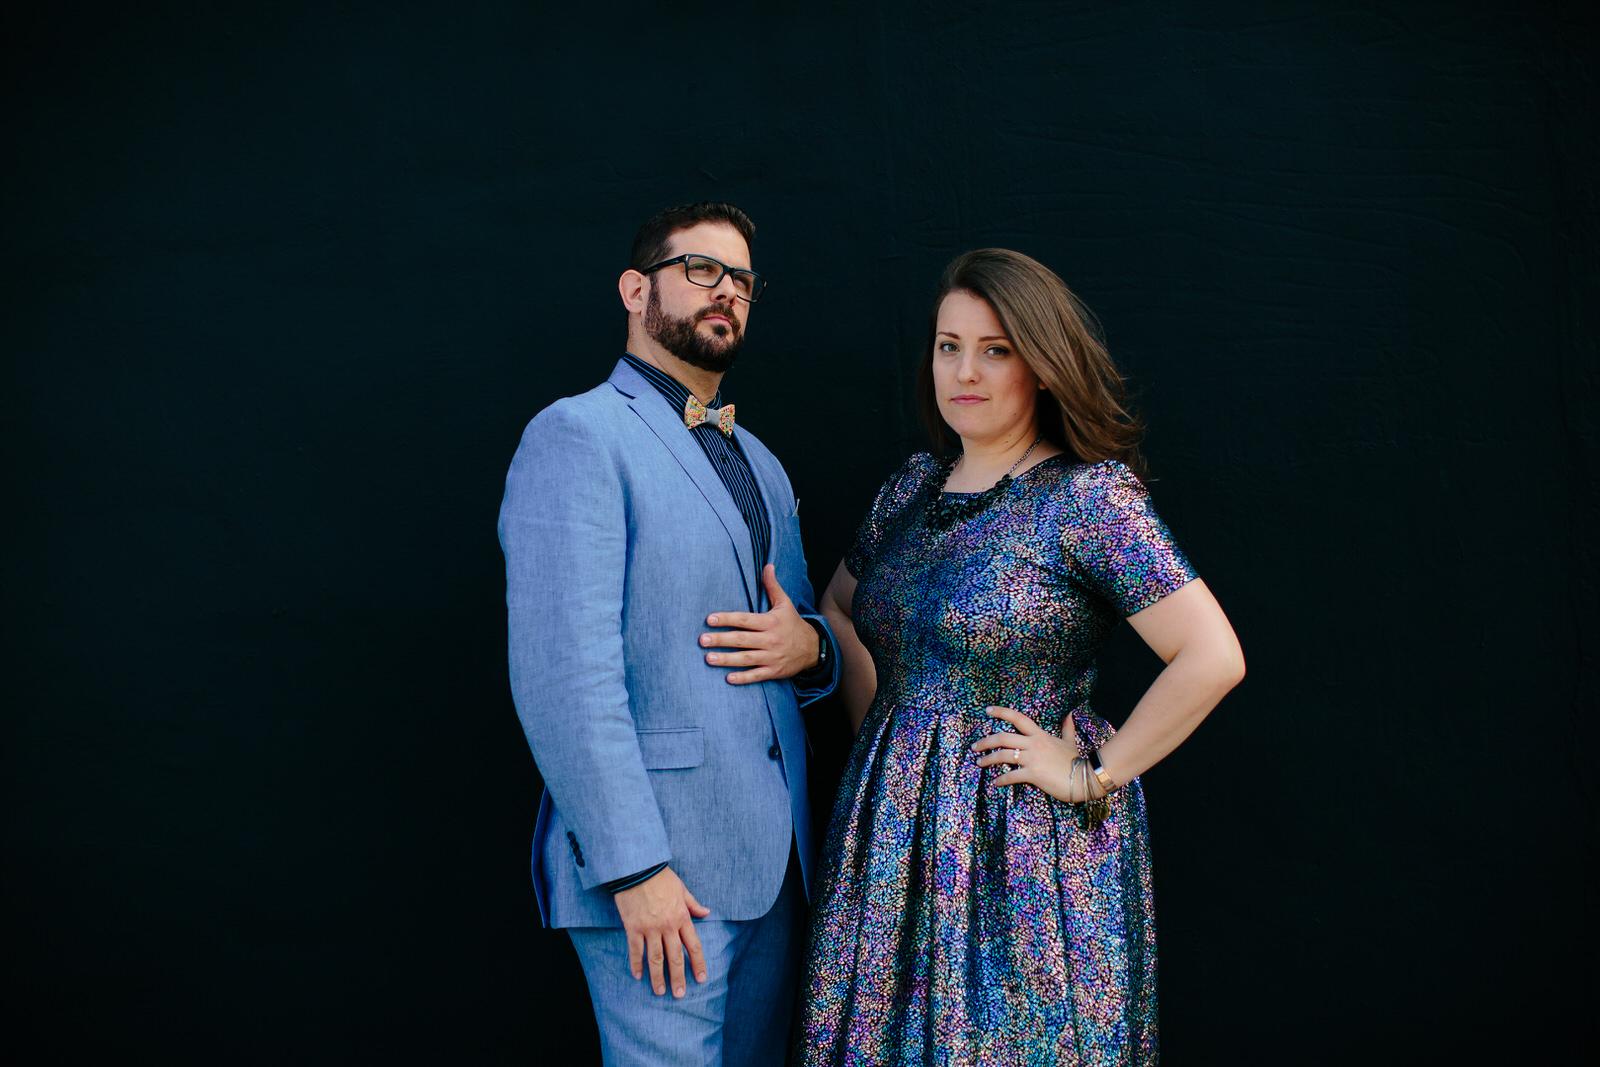 adorable_fashionable_couple_engagement_portraits.jpg